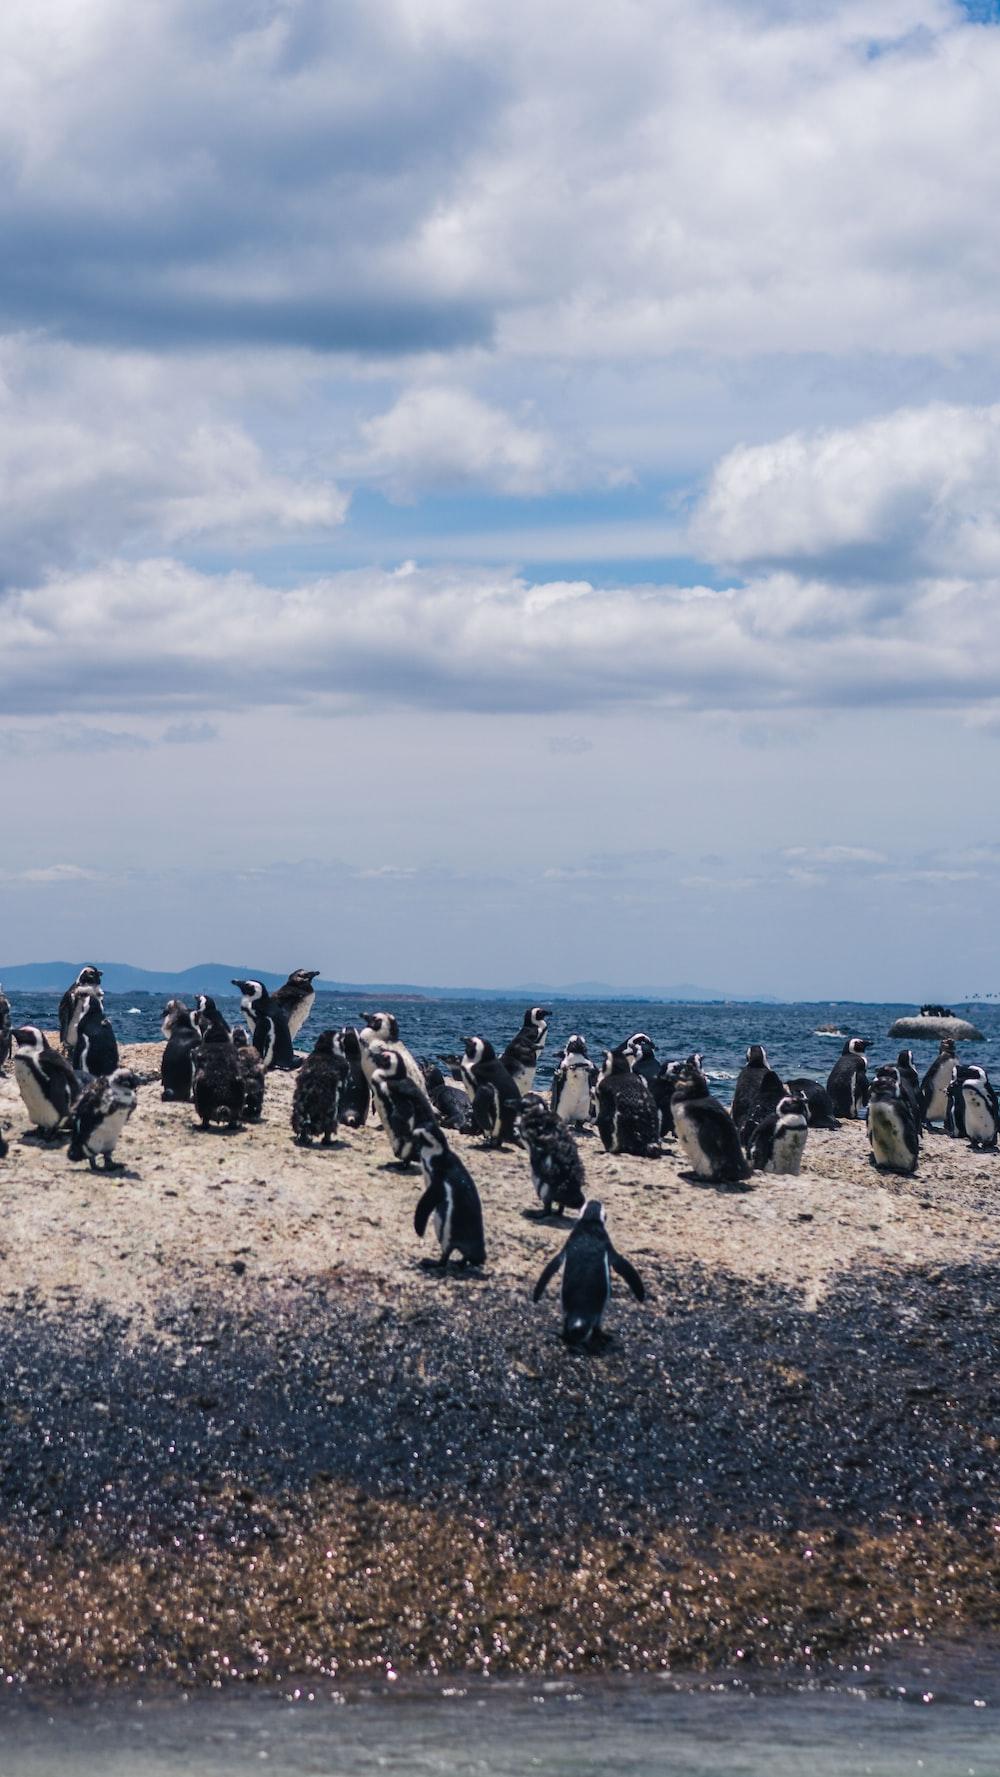 herd of penguins on seashore